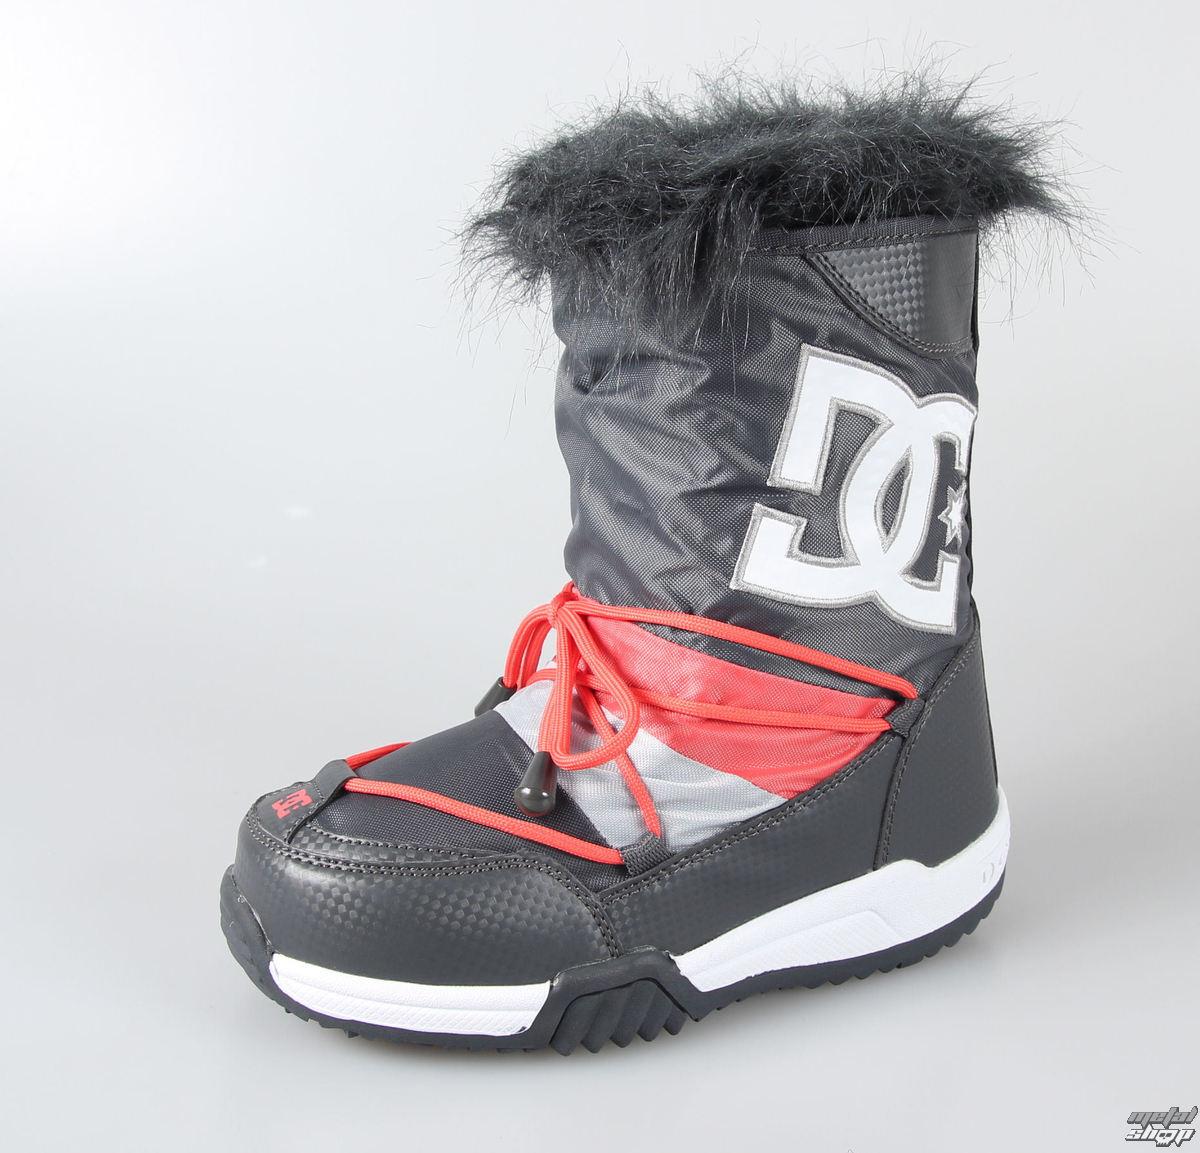 boty dámské -zimní- DC - Lodge - DARK SHADOW-ARMOR